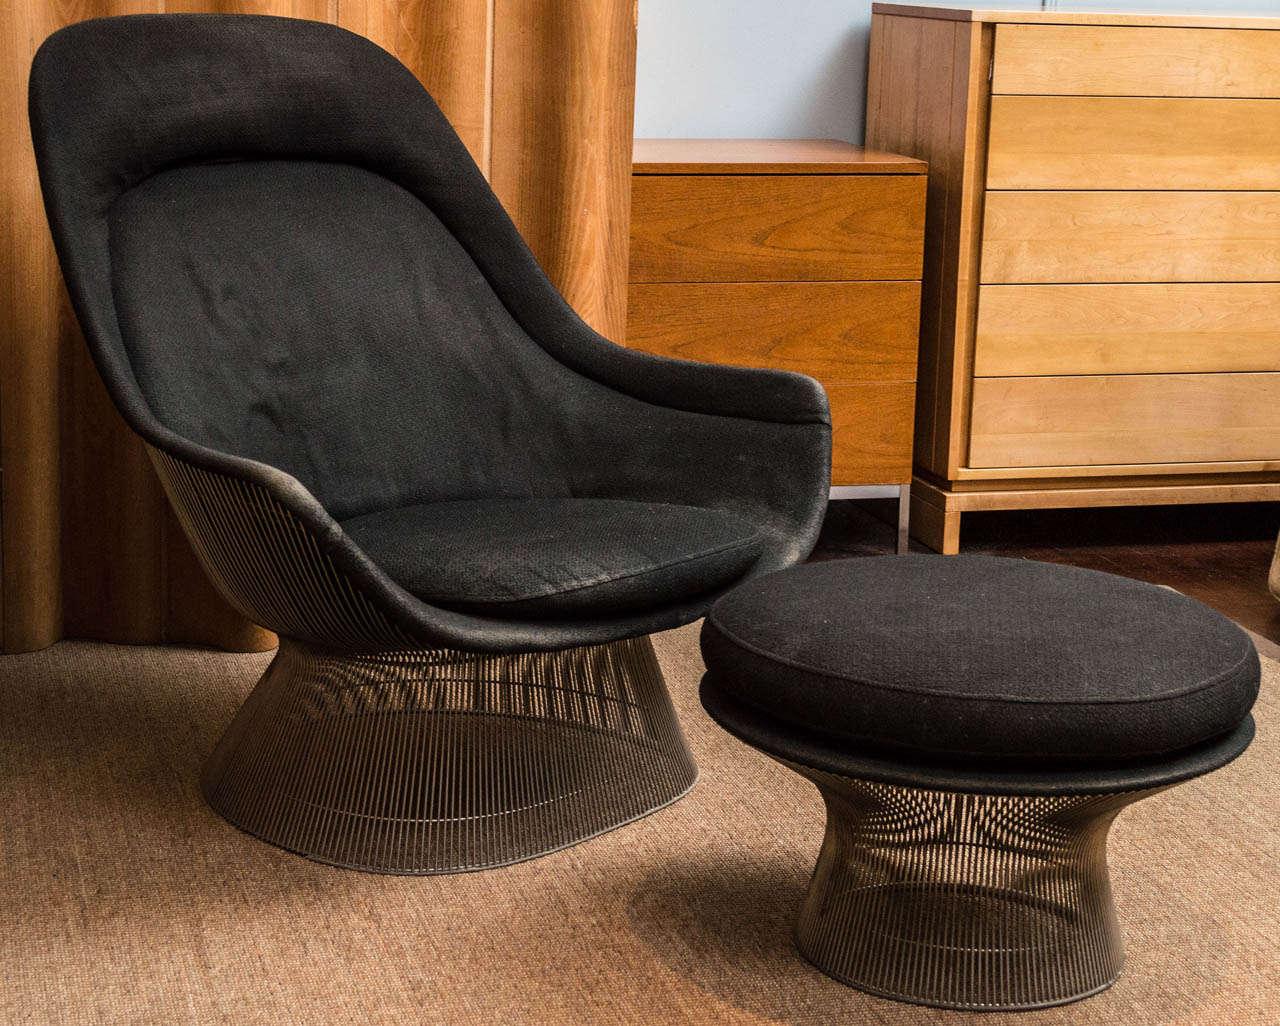 Warren Platner Lounge Chair And Ottoman At 1stdibs